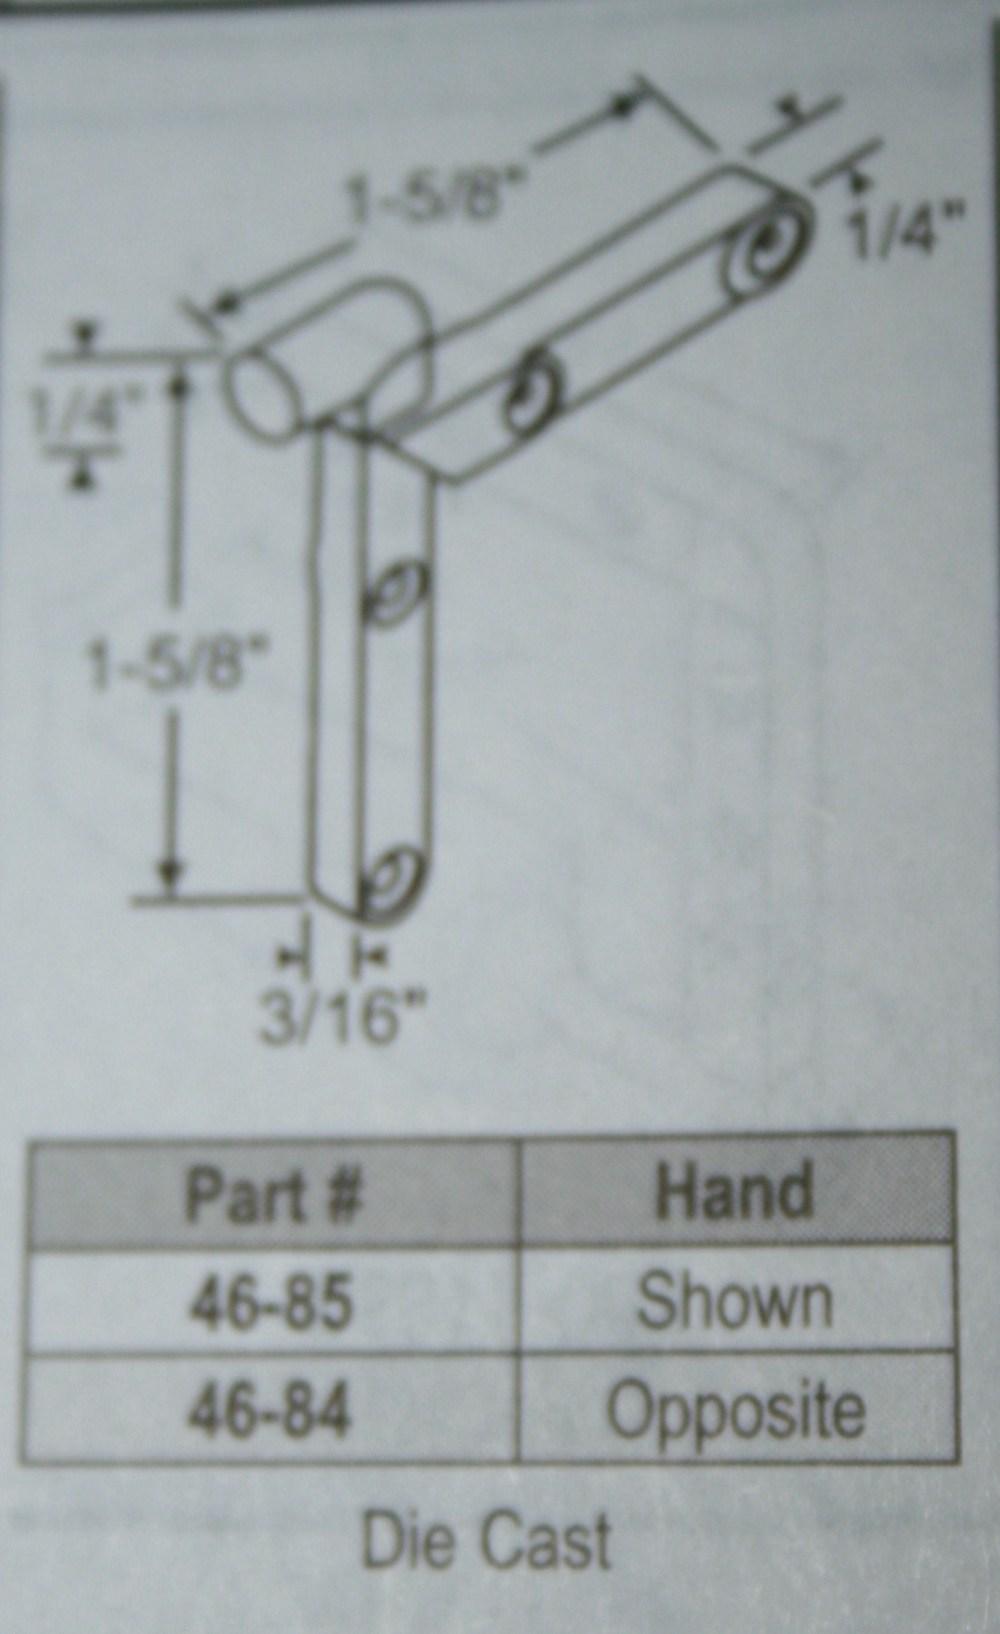 medium resolution of corner key 46 84 handed 1 5 8 x 1 5 8 die cast